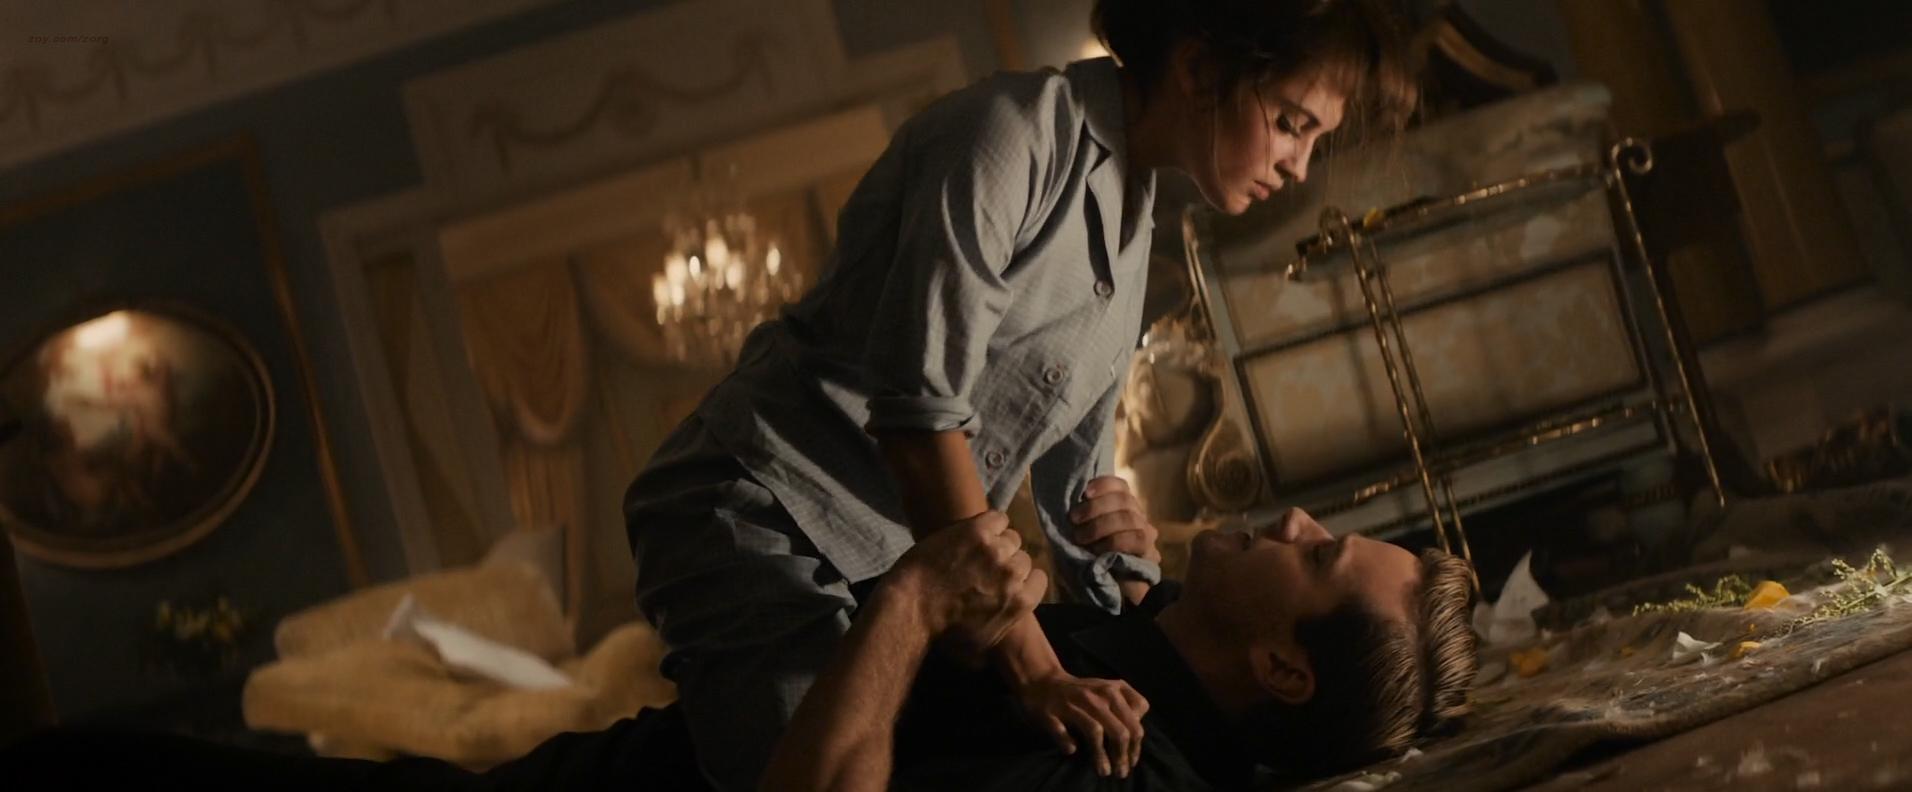 Alicia Vikander hot and sexy and unaccredited butt see through - The Man from U.N.C.L.E. (2015) HD 1080p Web-Dl (4)